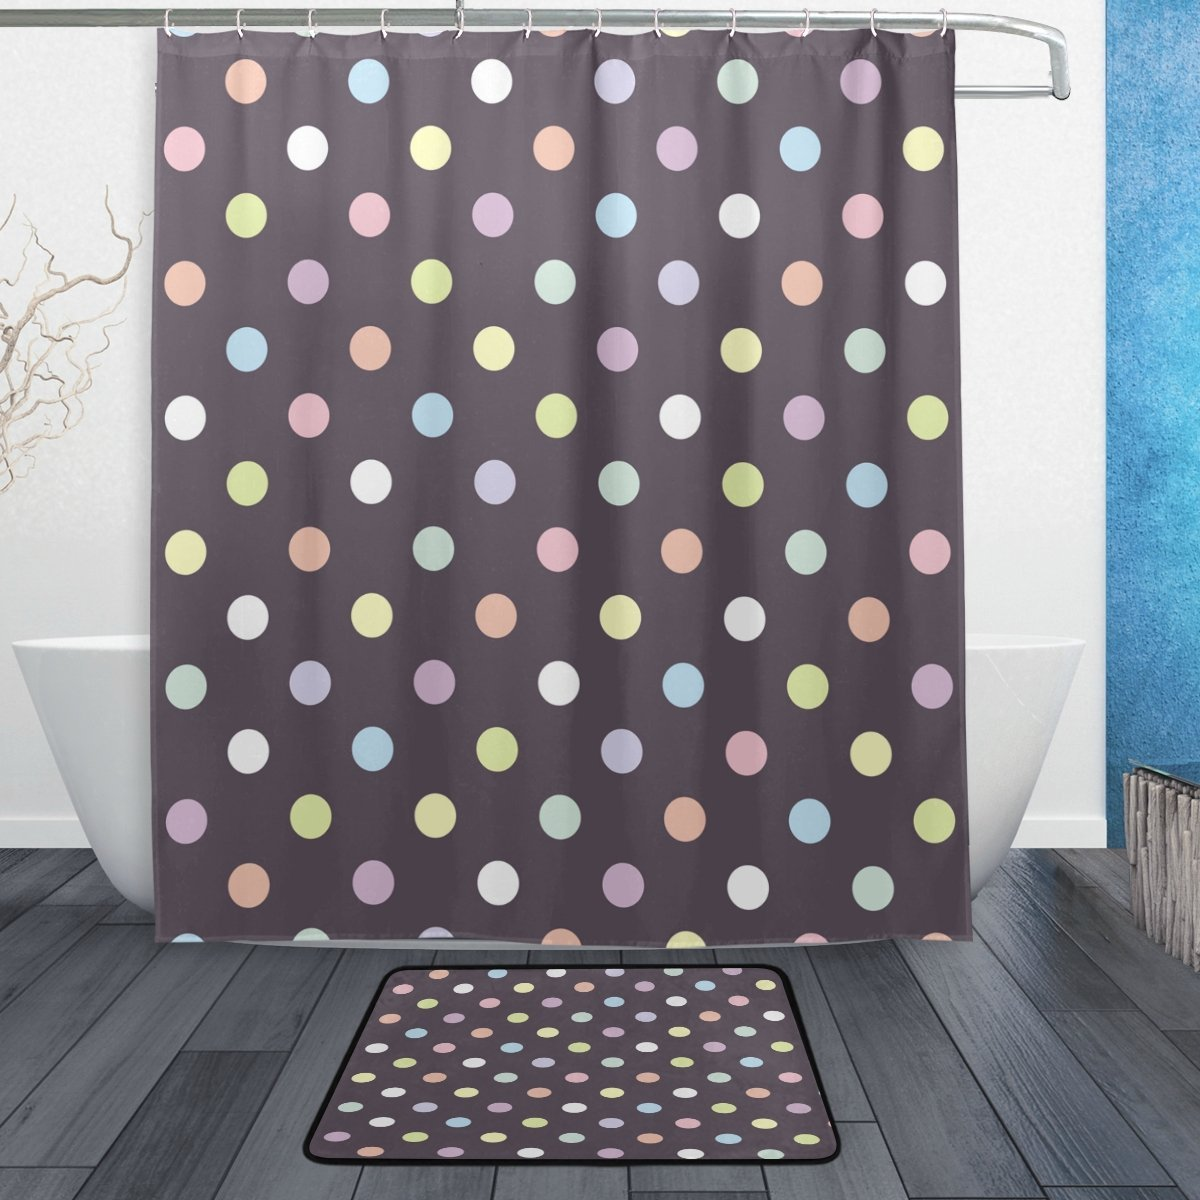 Retro Colorful Polka Dot Waterproof Polyester Fabric